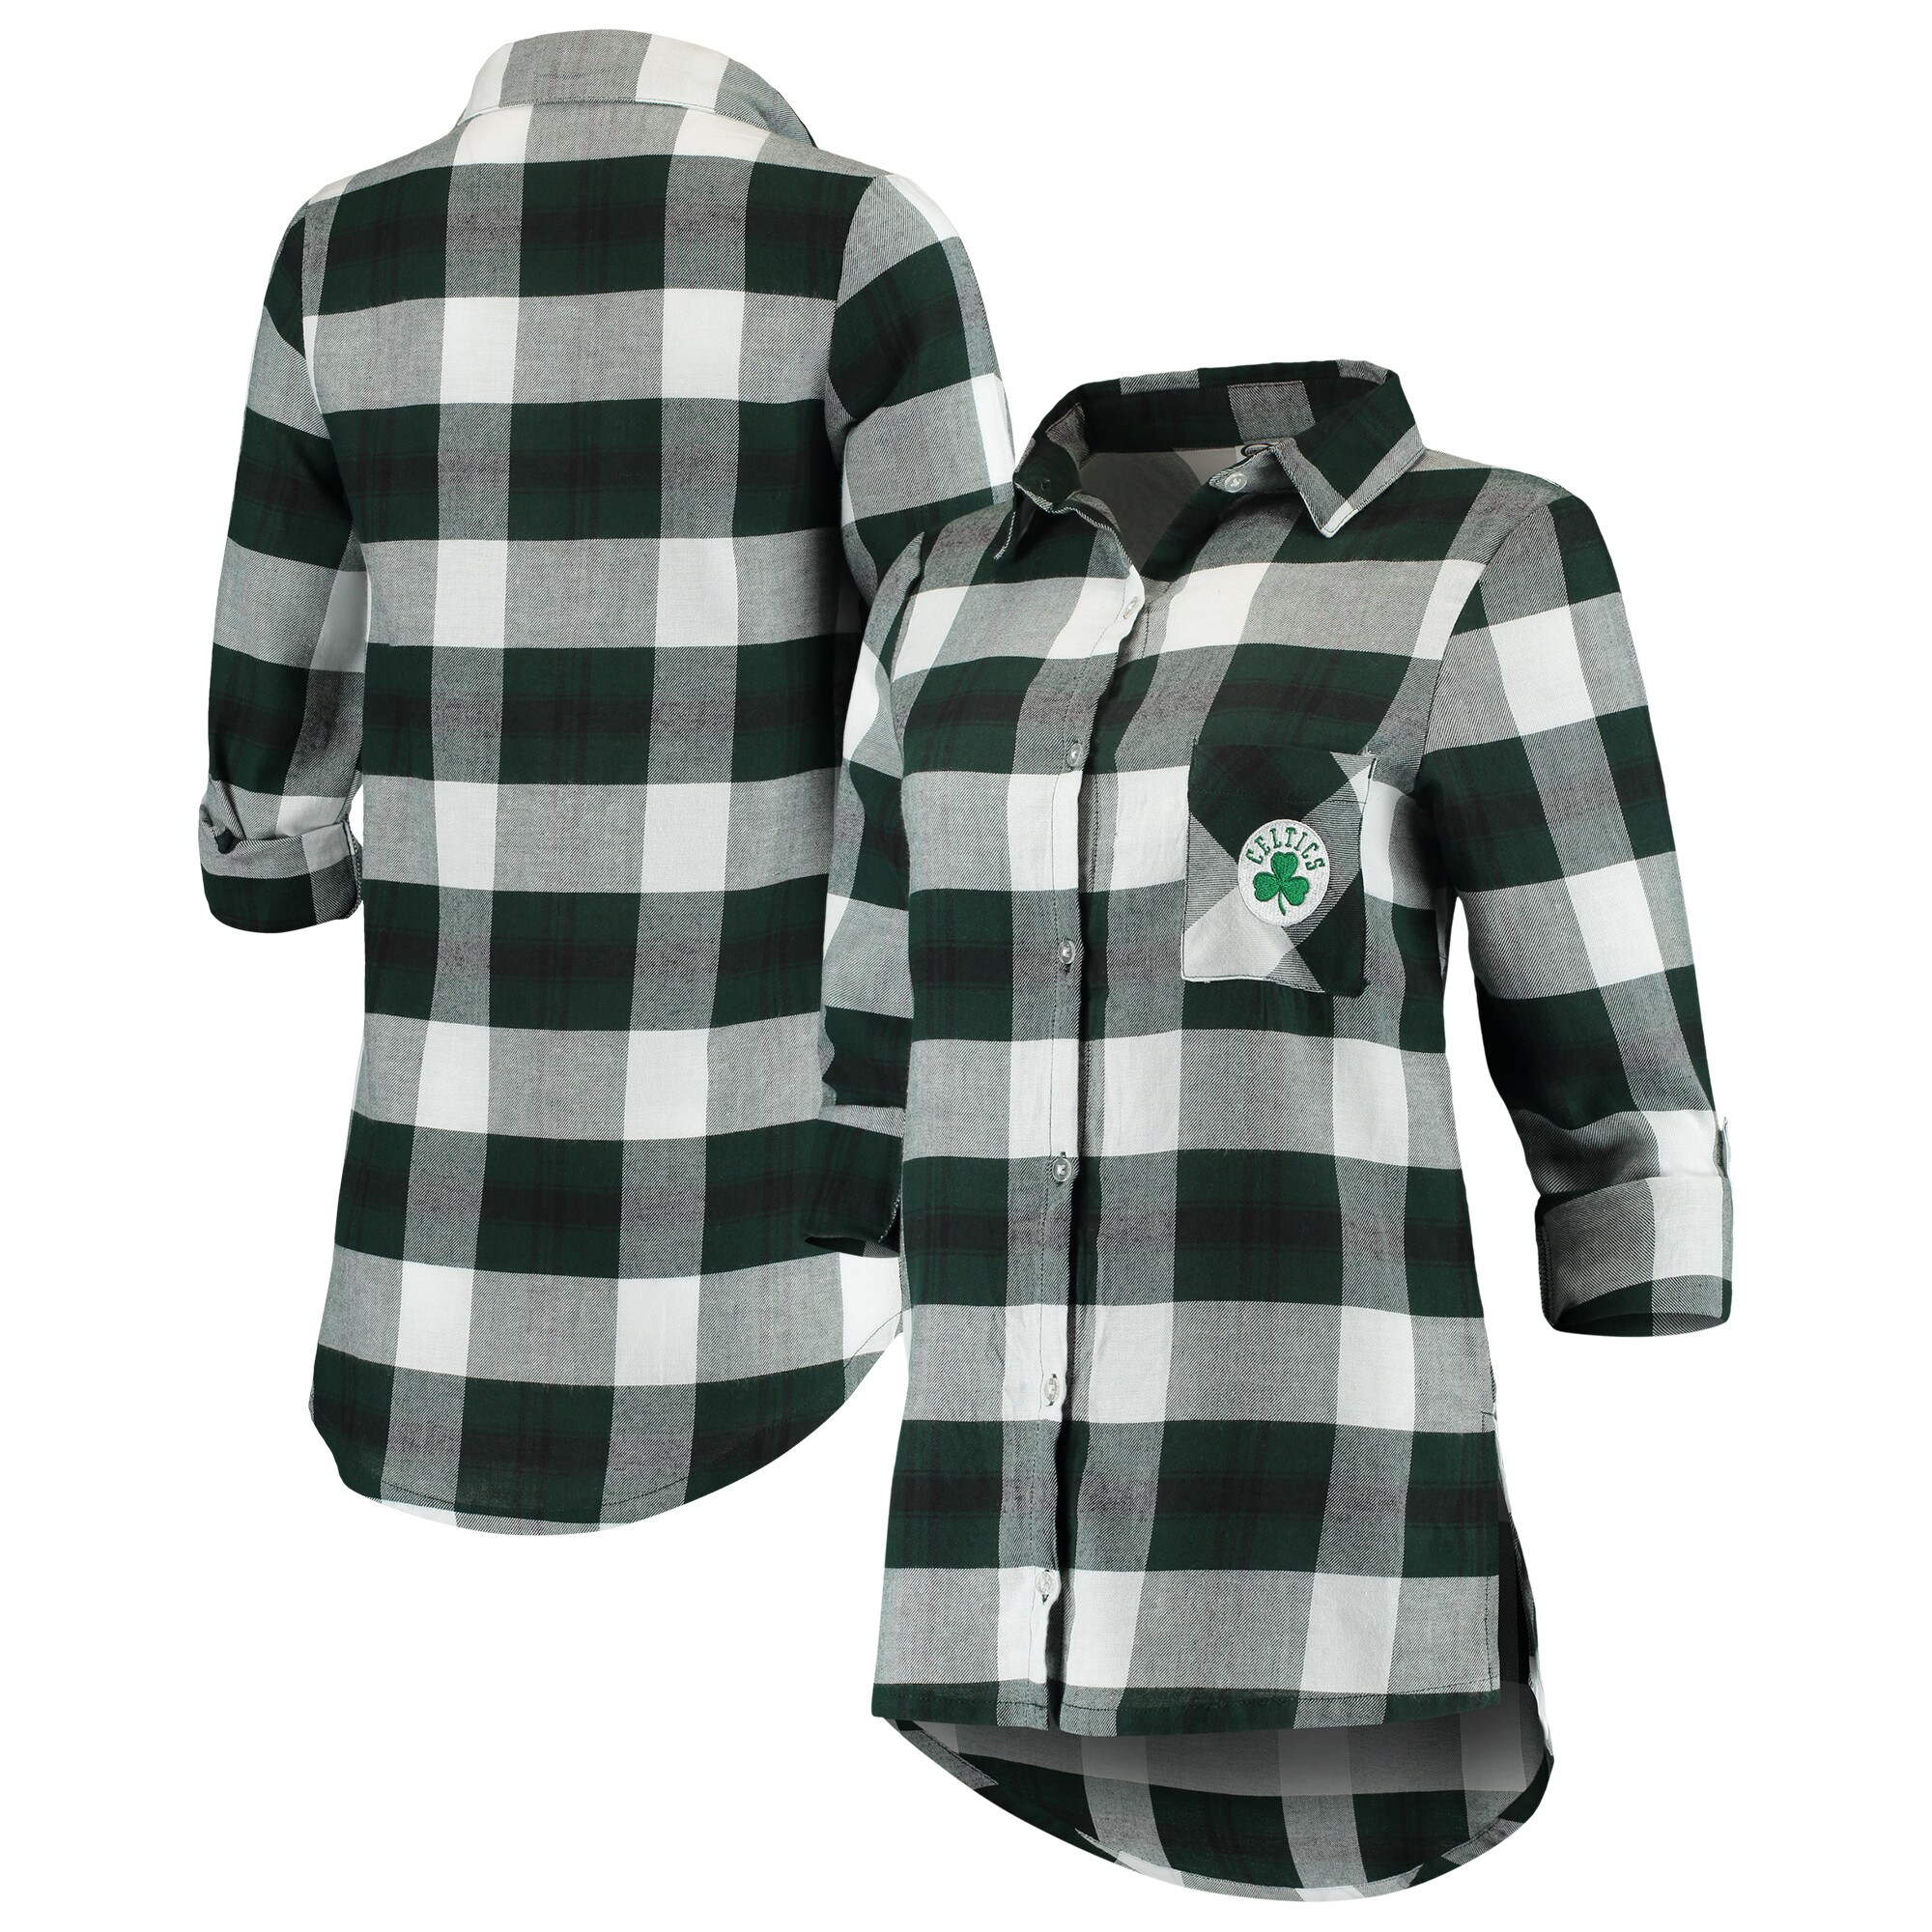 Boston Celtics Concepts Sport Women's Headway Long Sleeve Plaid Tunic - Green/Black